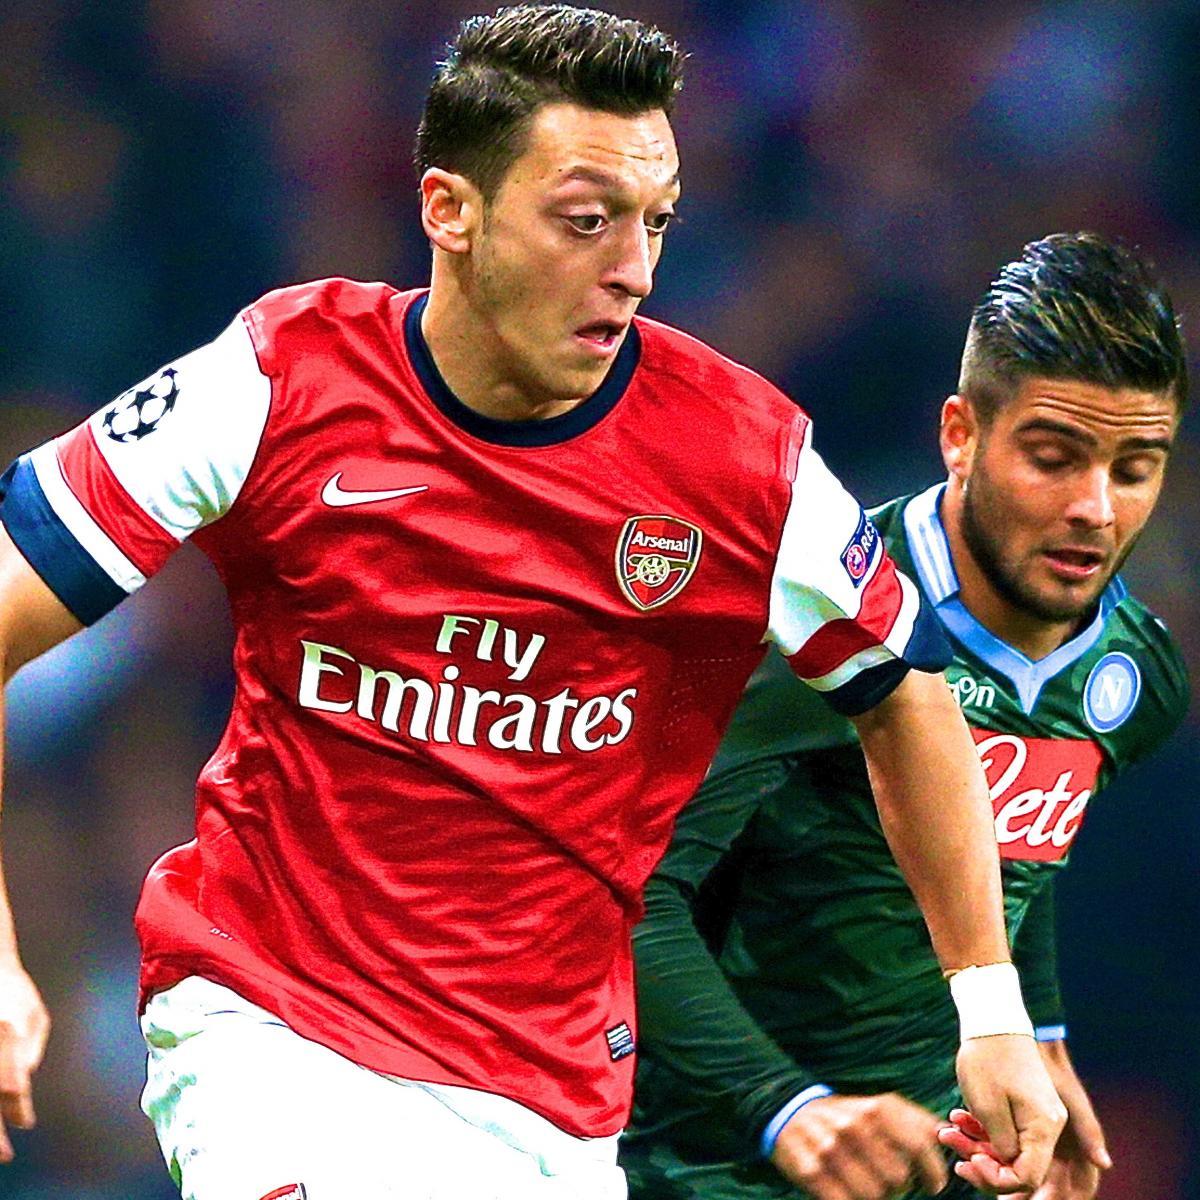 Arsenal Vs Barcelona Live Score Highlights From: Arsenal Vs. Napoli: Live Score, Highlights, Recap